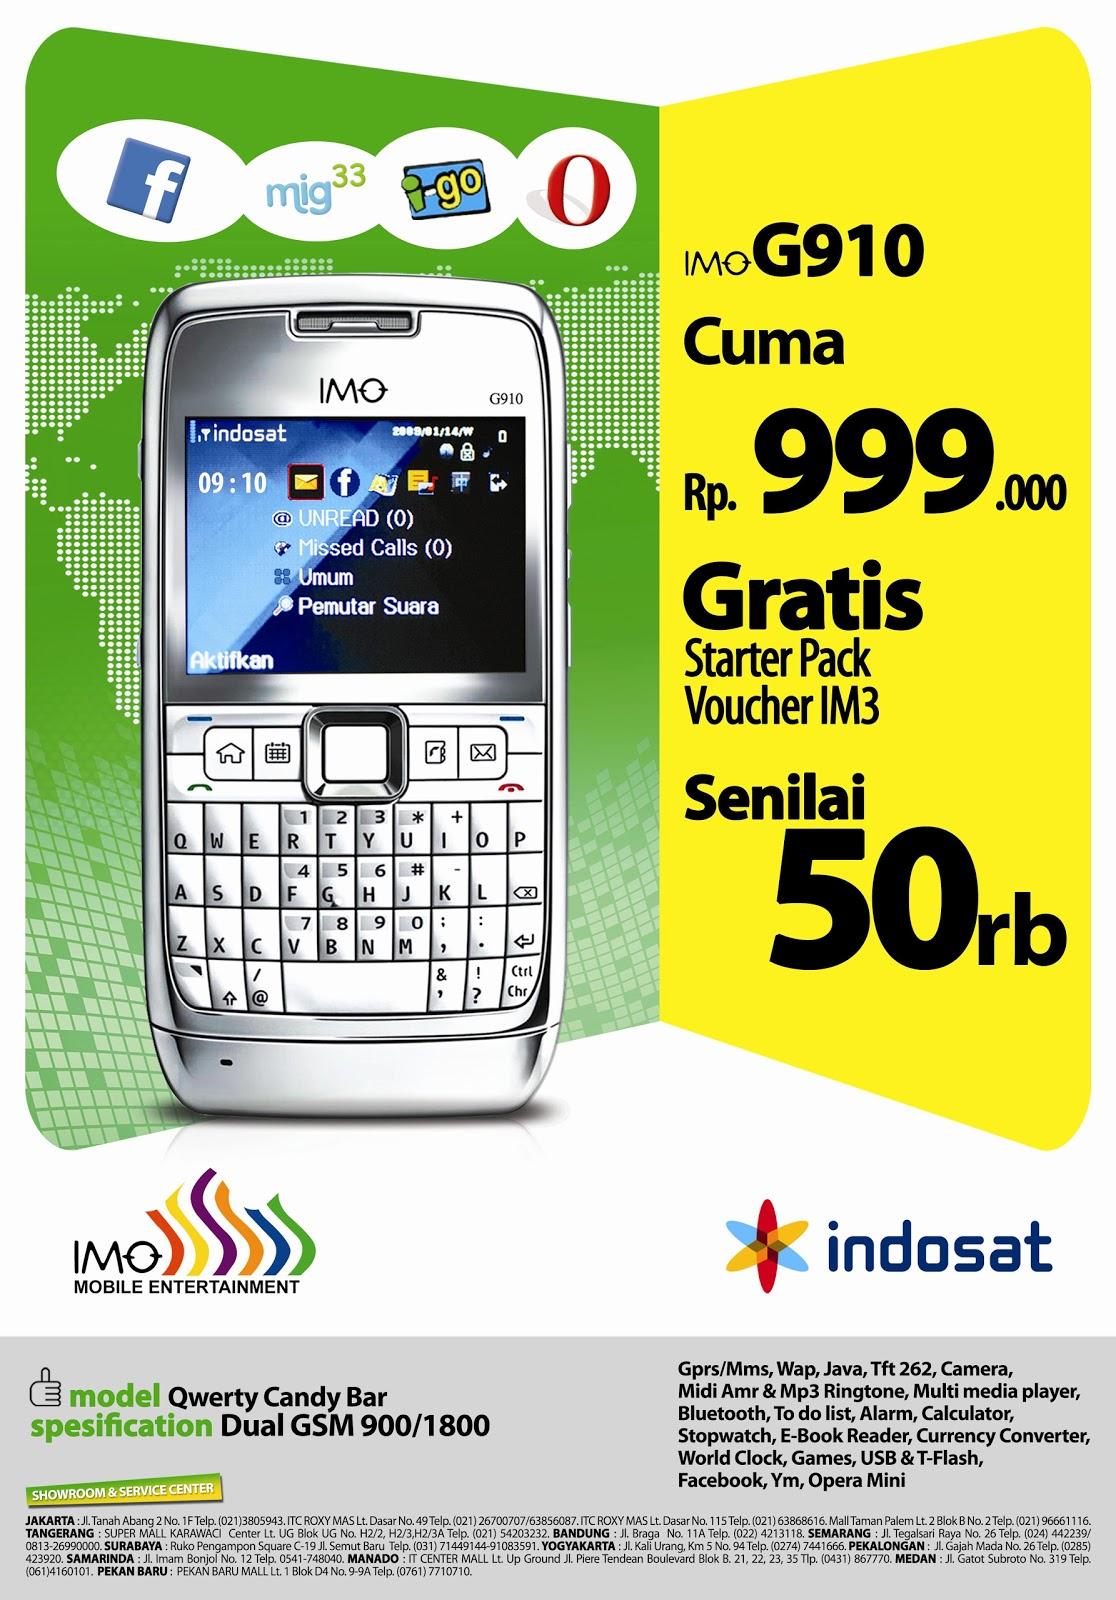 Januari 2011 Nexcom Speed Tablet Android Ics Dual Sim Harga Hp Imo G910 Terbaru Blackberry 2013